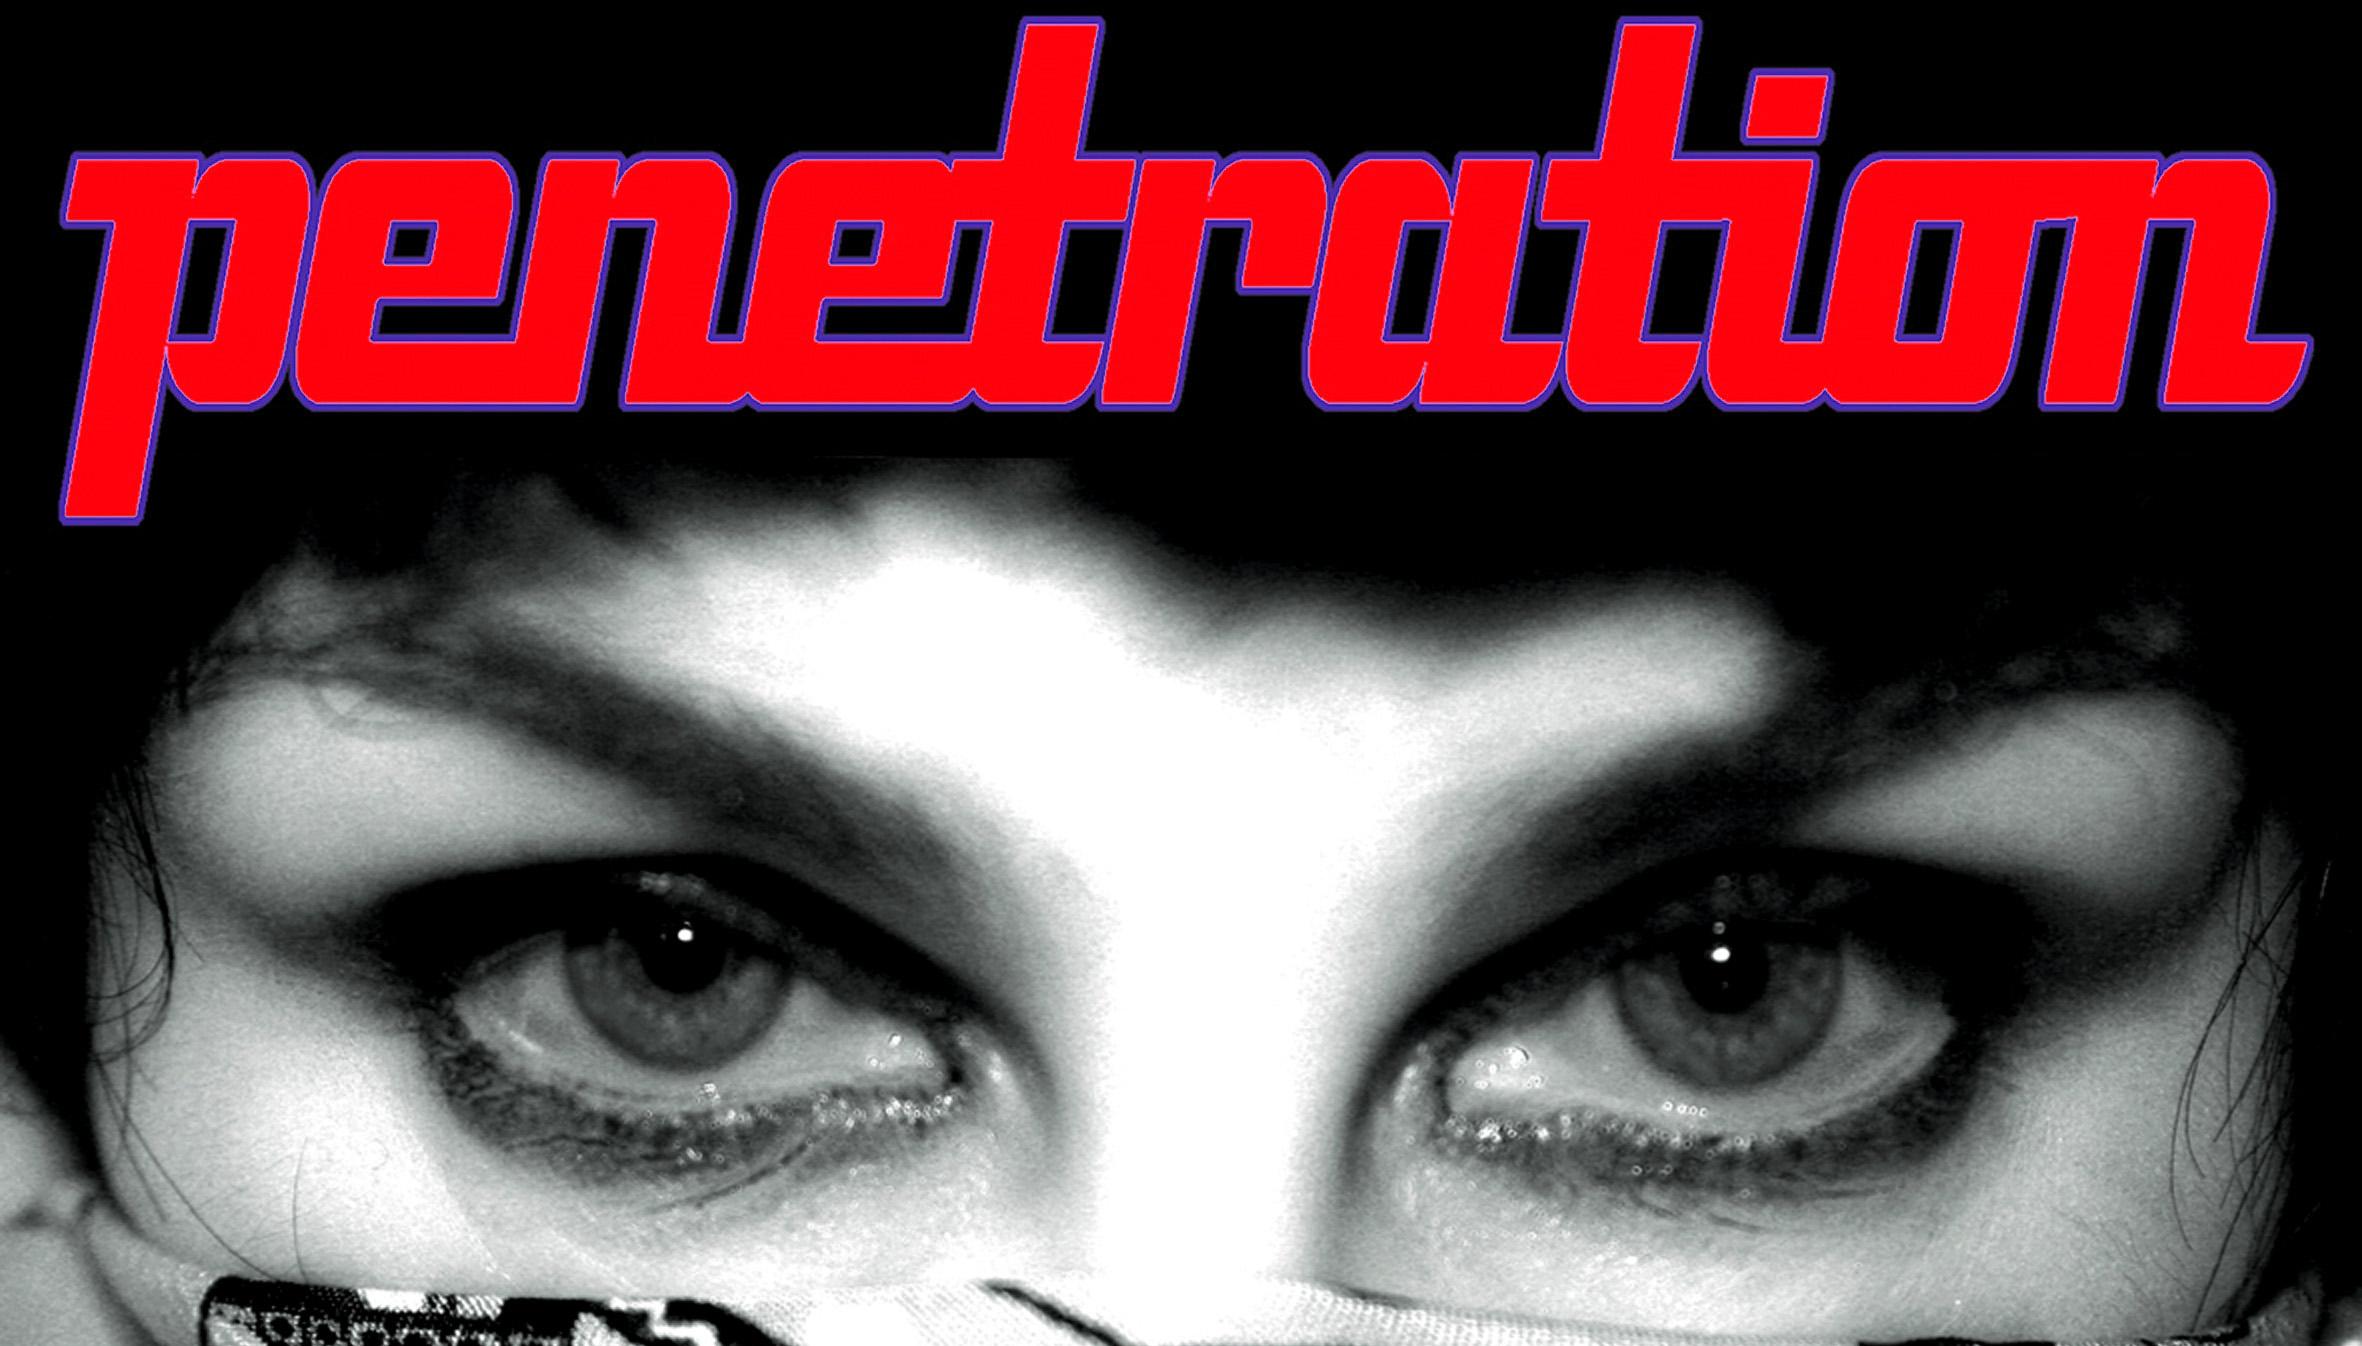 PENETRATION-WebsiteHeader2013